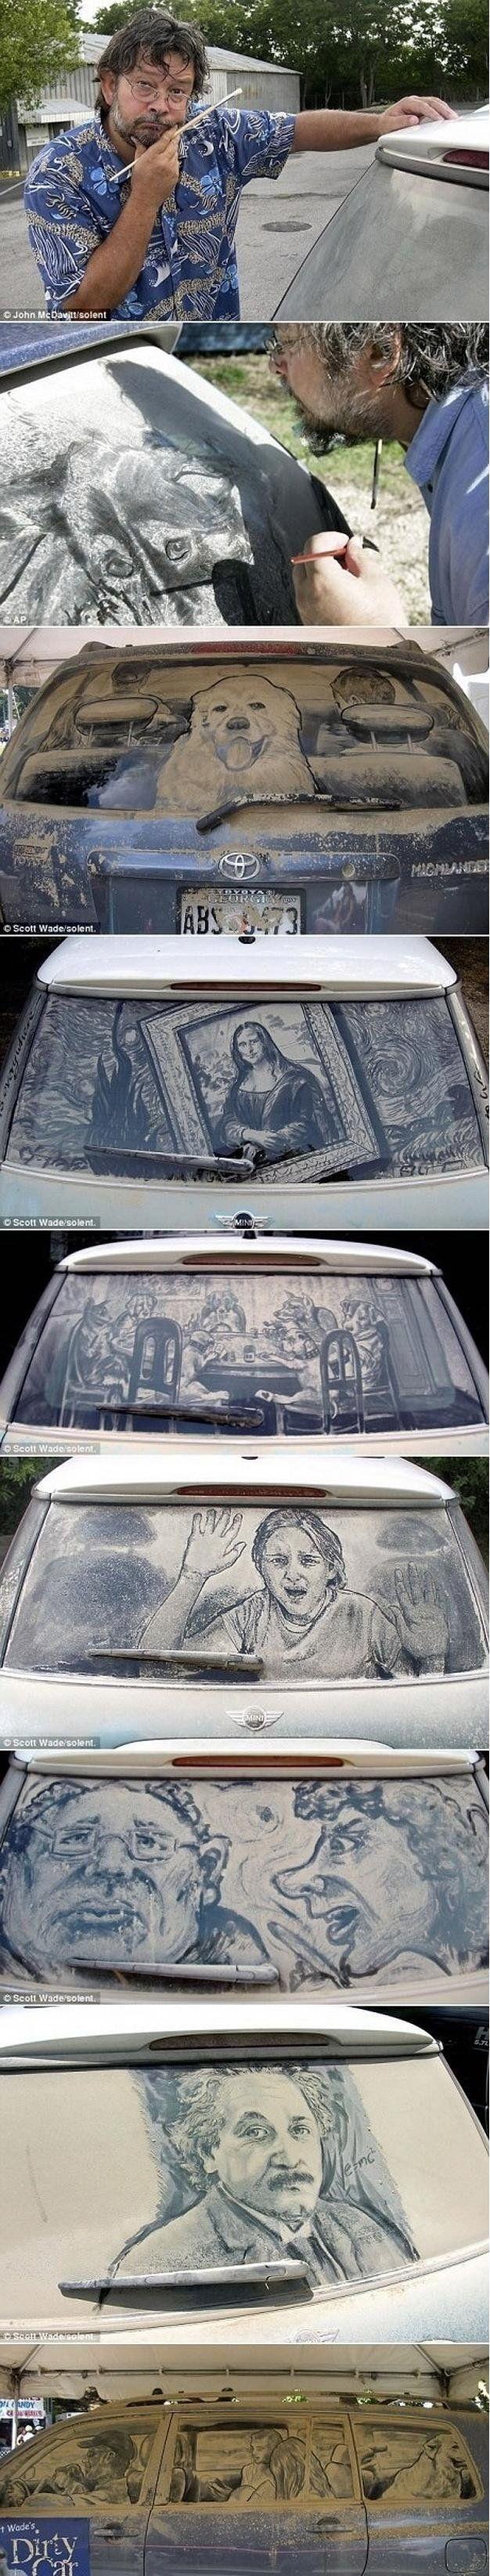 Dirty Windshield Art